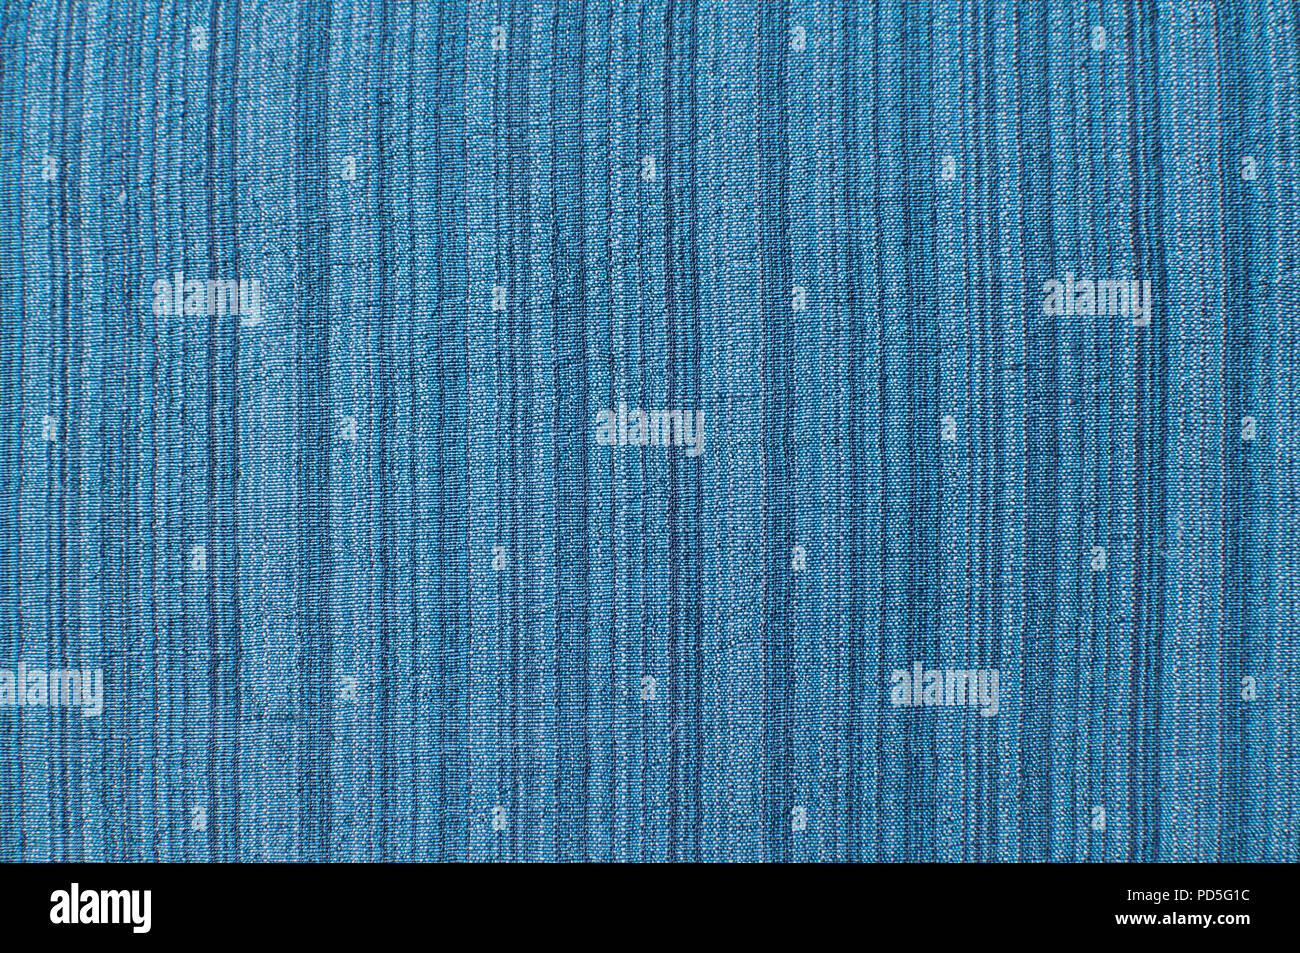 b8c3b6df50 Seda y lino color azul tejido natural textura closeup como fondo textil  Imagen De Stock